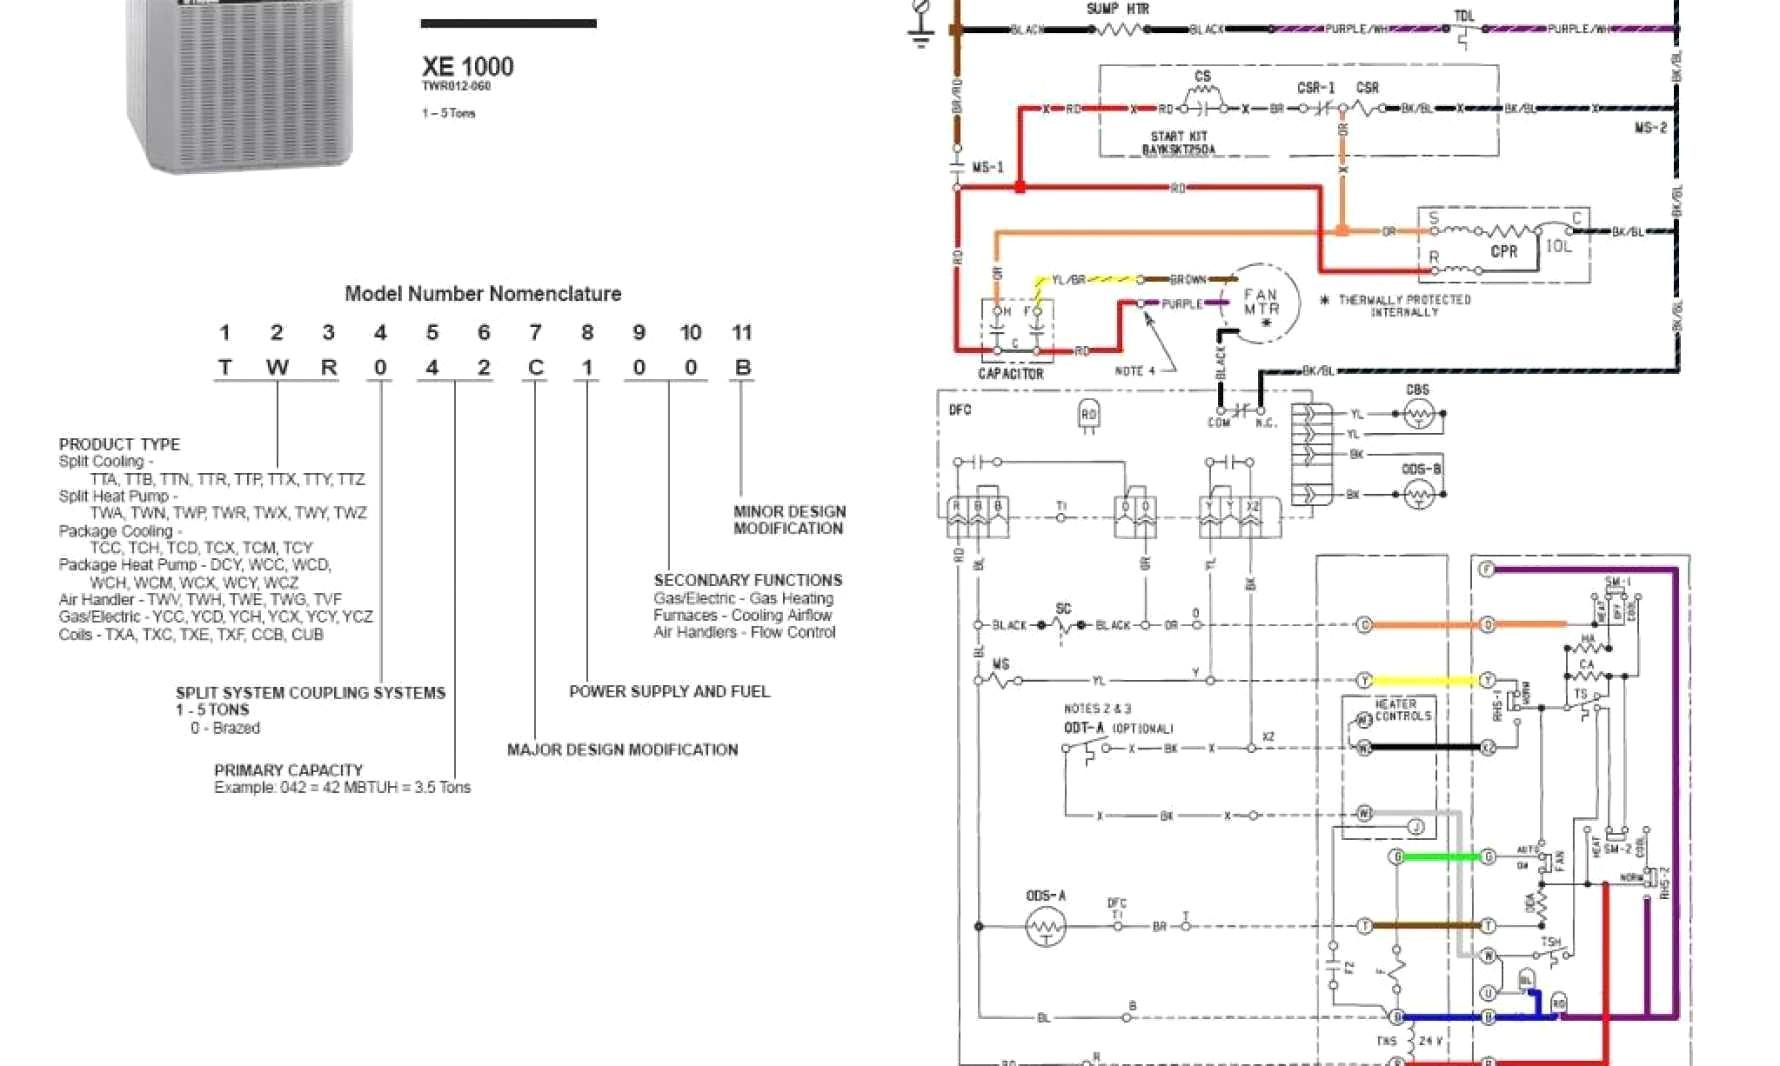 hight resolution of trane model tr200 wiring diagrams wiring diagram pass trane vfd wiring diagram tr200 wiring diagram everything